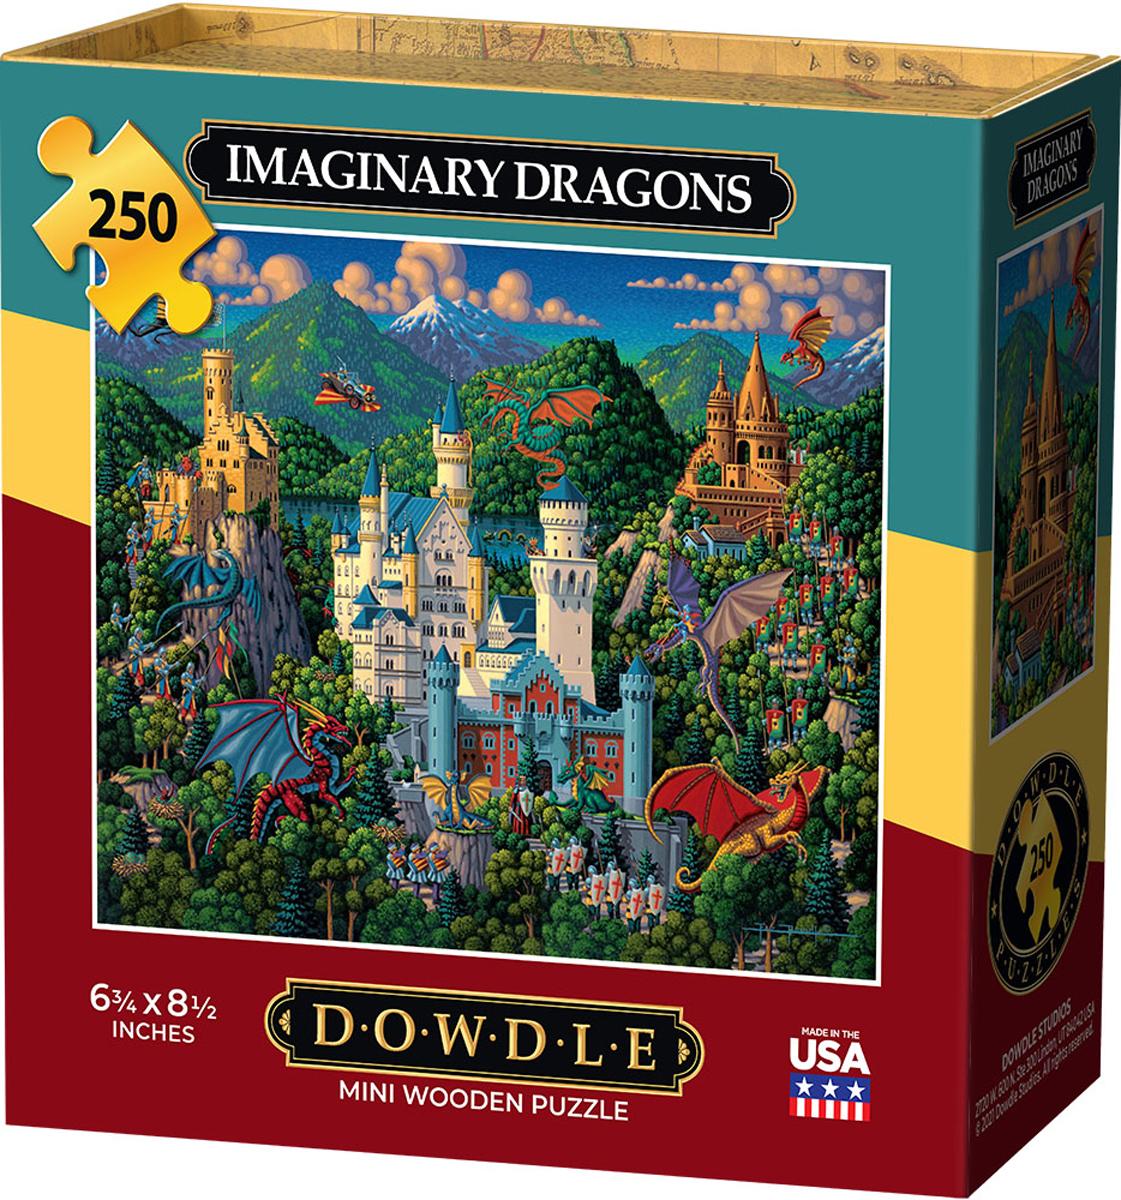 Imaginary Dragons Dragons Jigsaw Puzzle